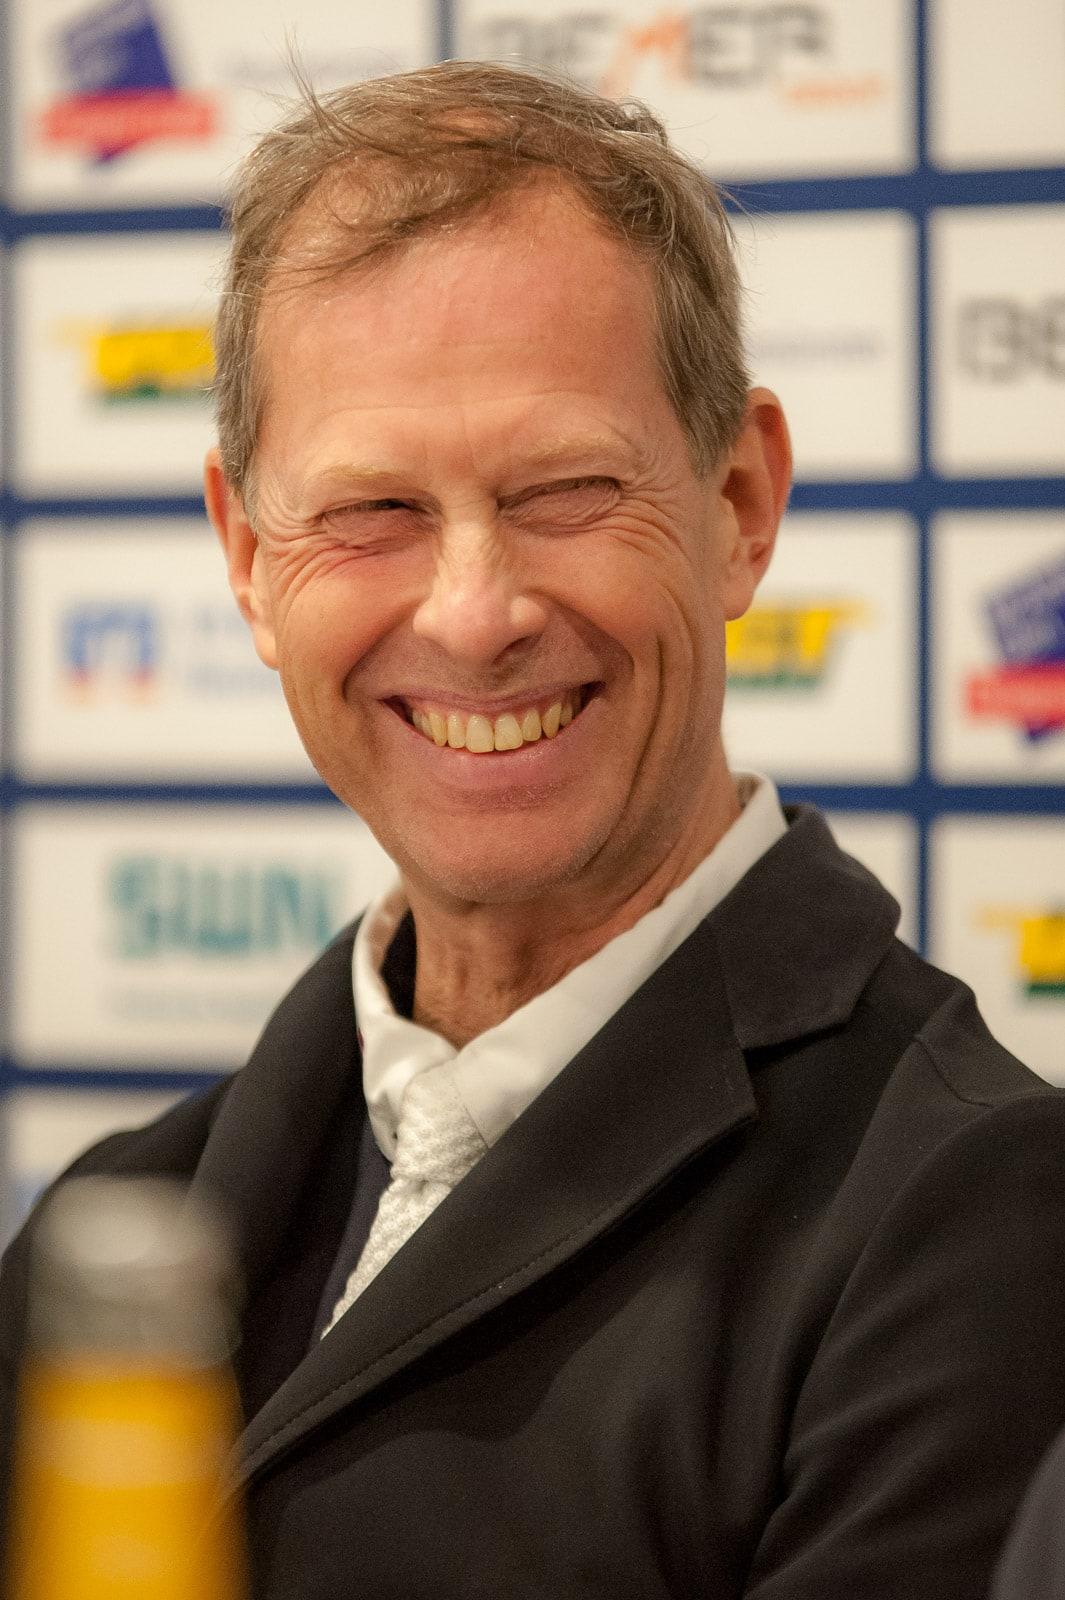 Rolf-Göran Bengtsson